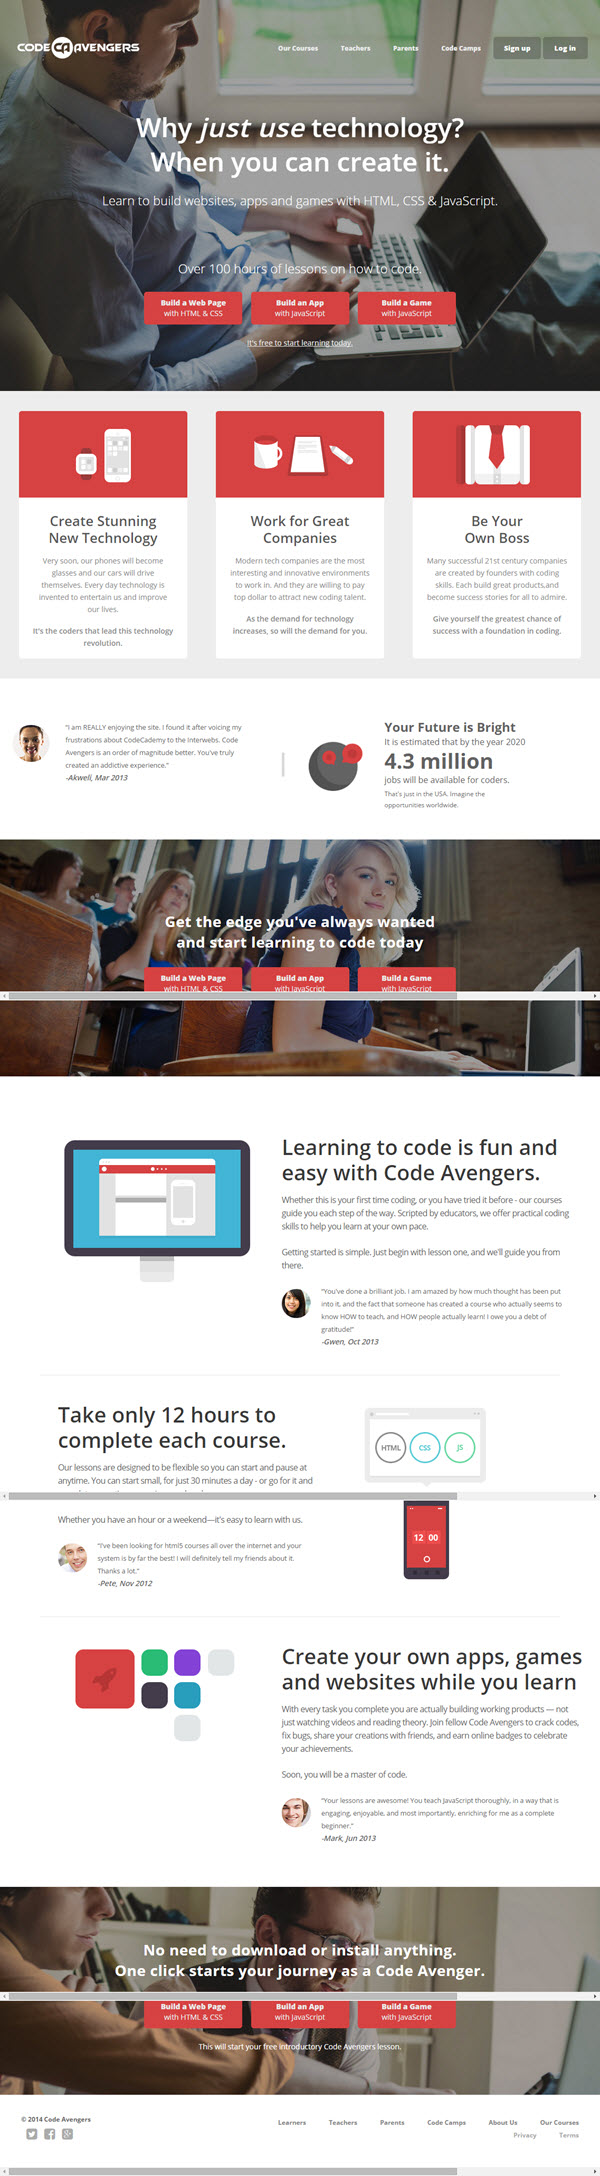 Designing your own Website - Assessment | Code Avengers